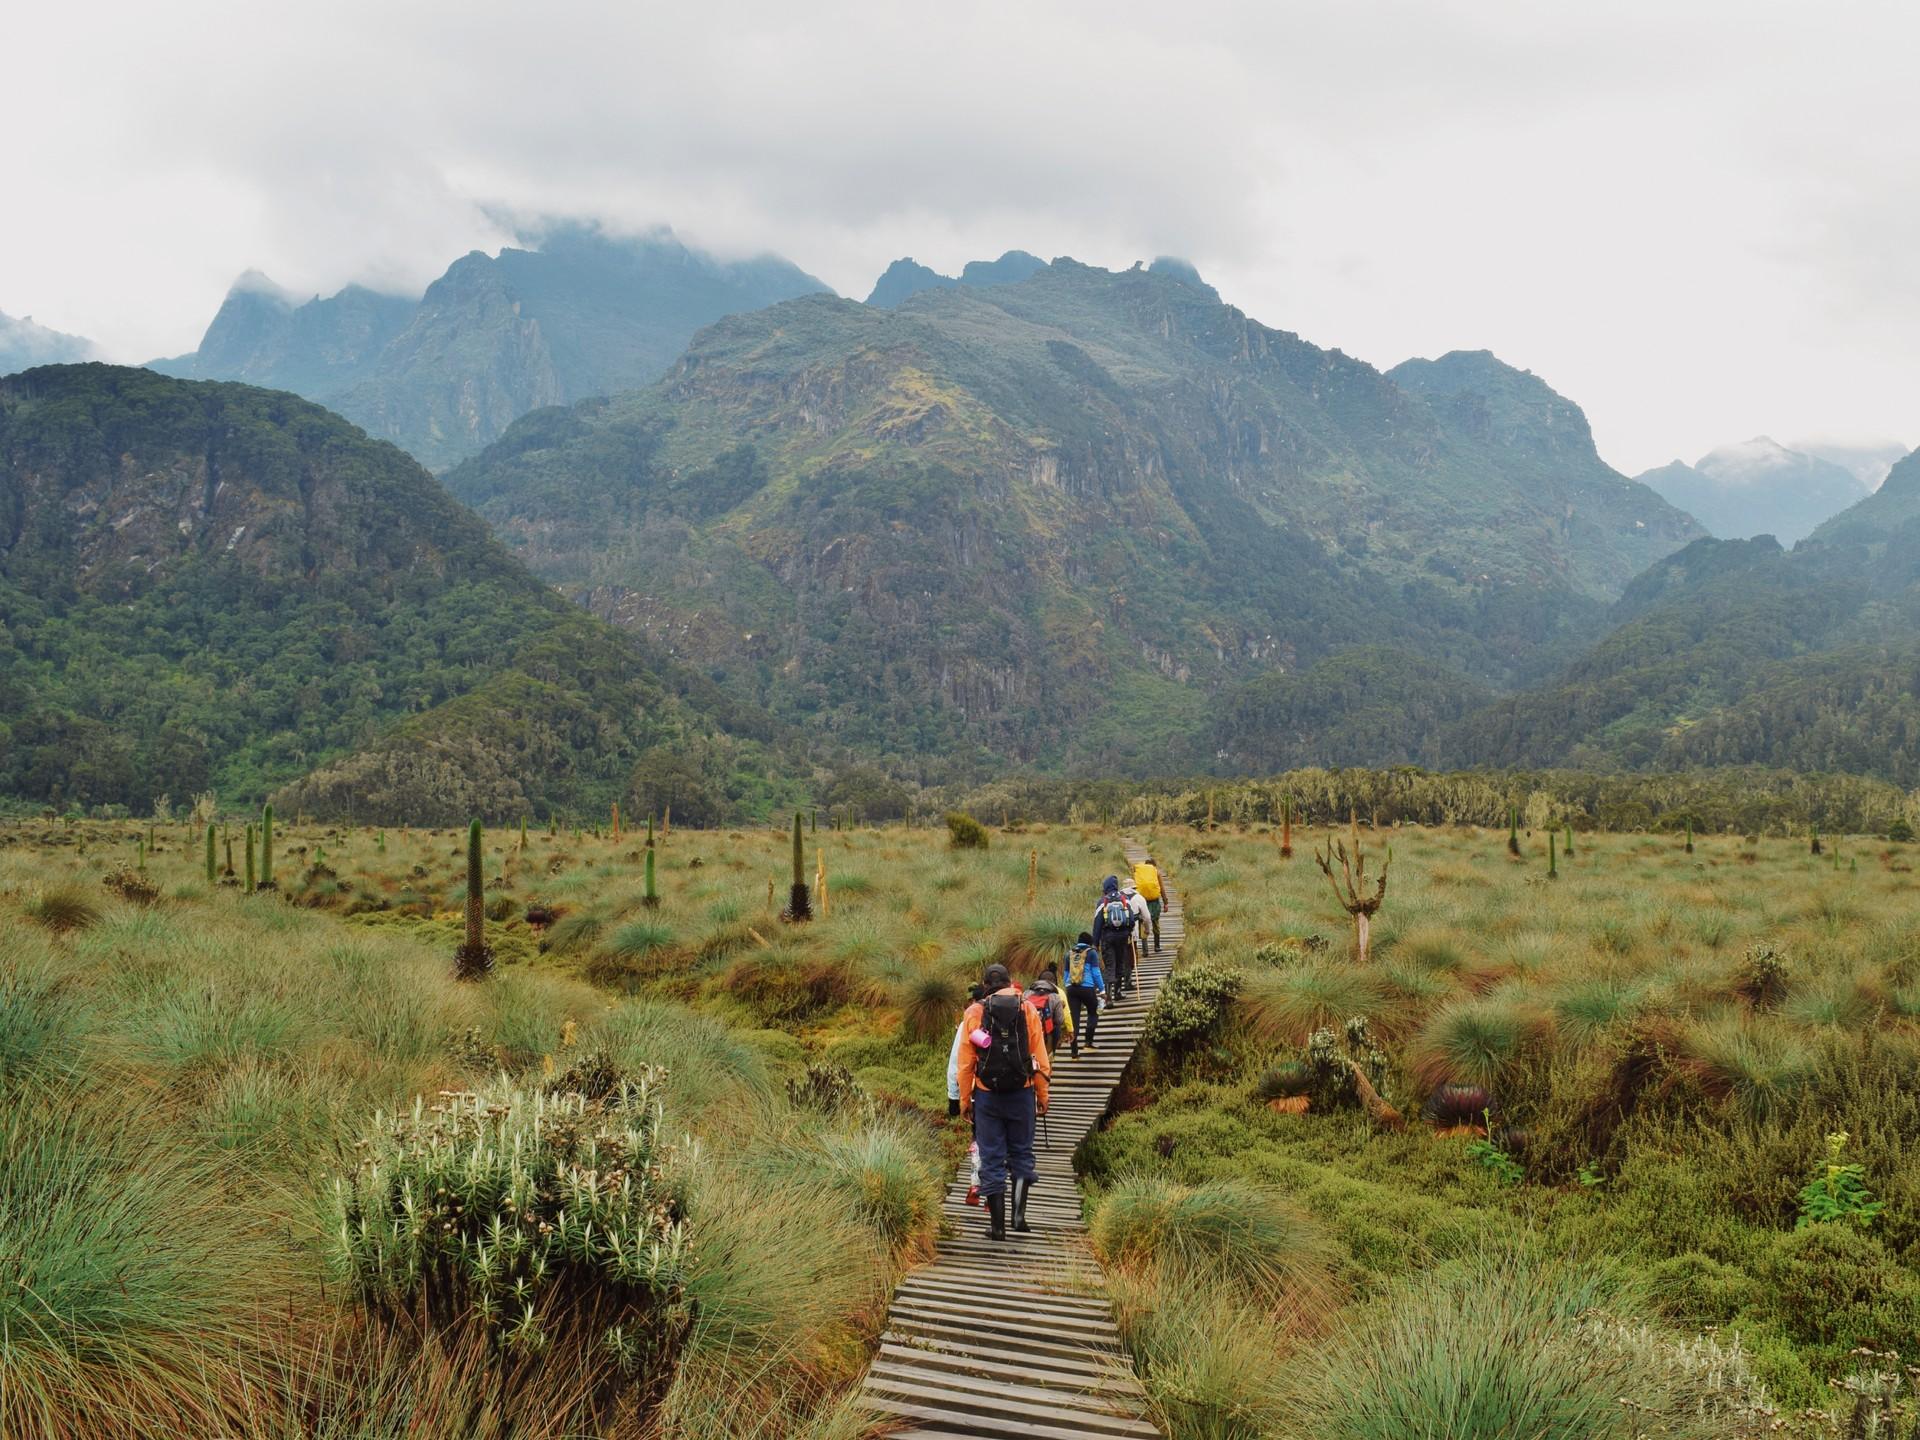 Best of both worlds: Rwenzori Mountains National Park